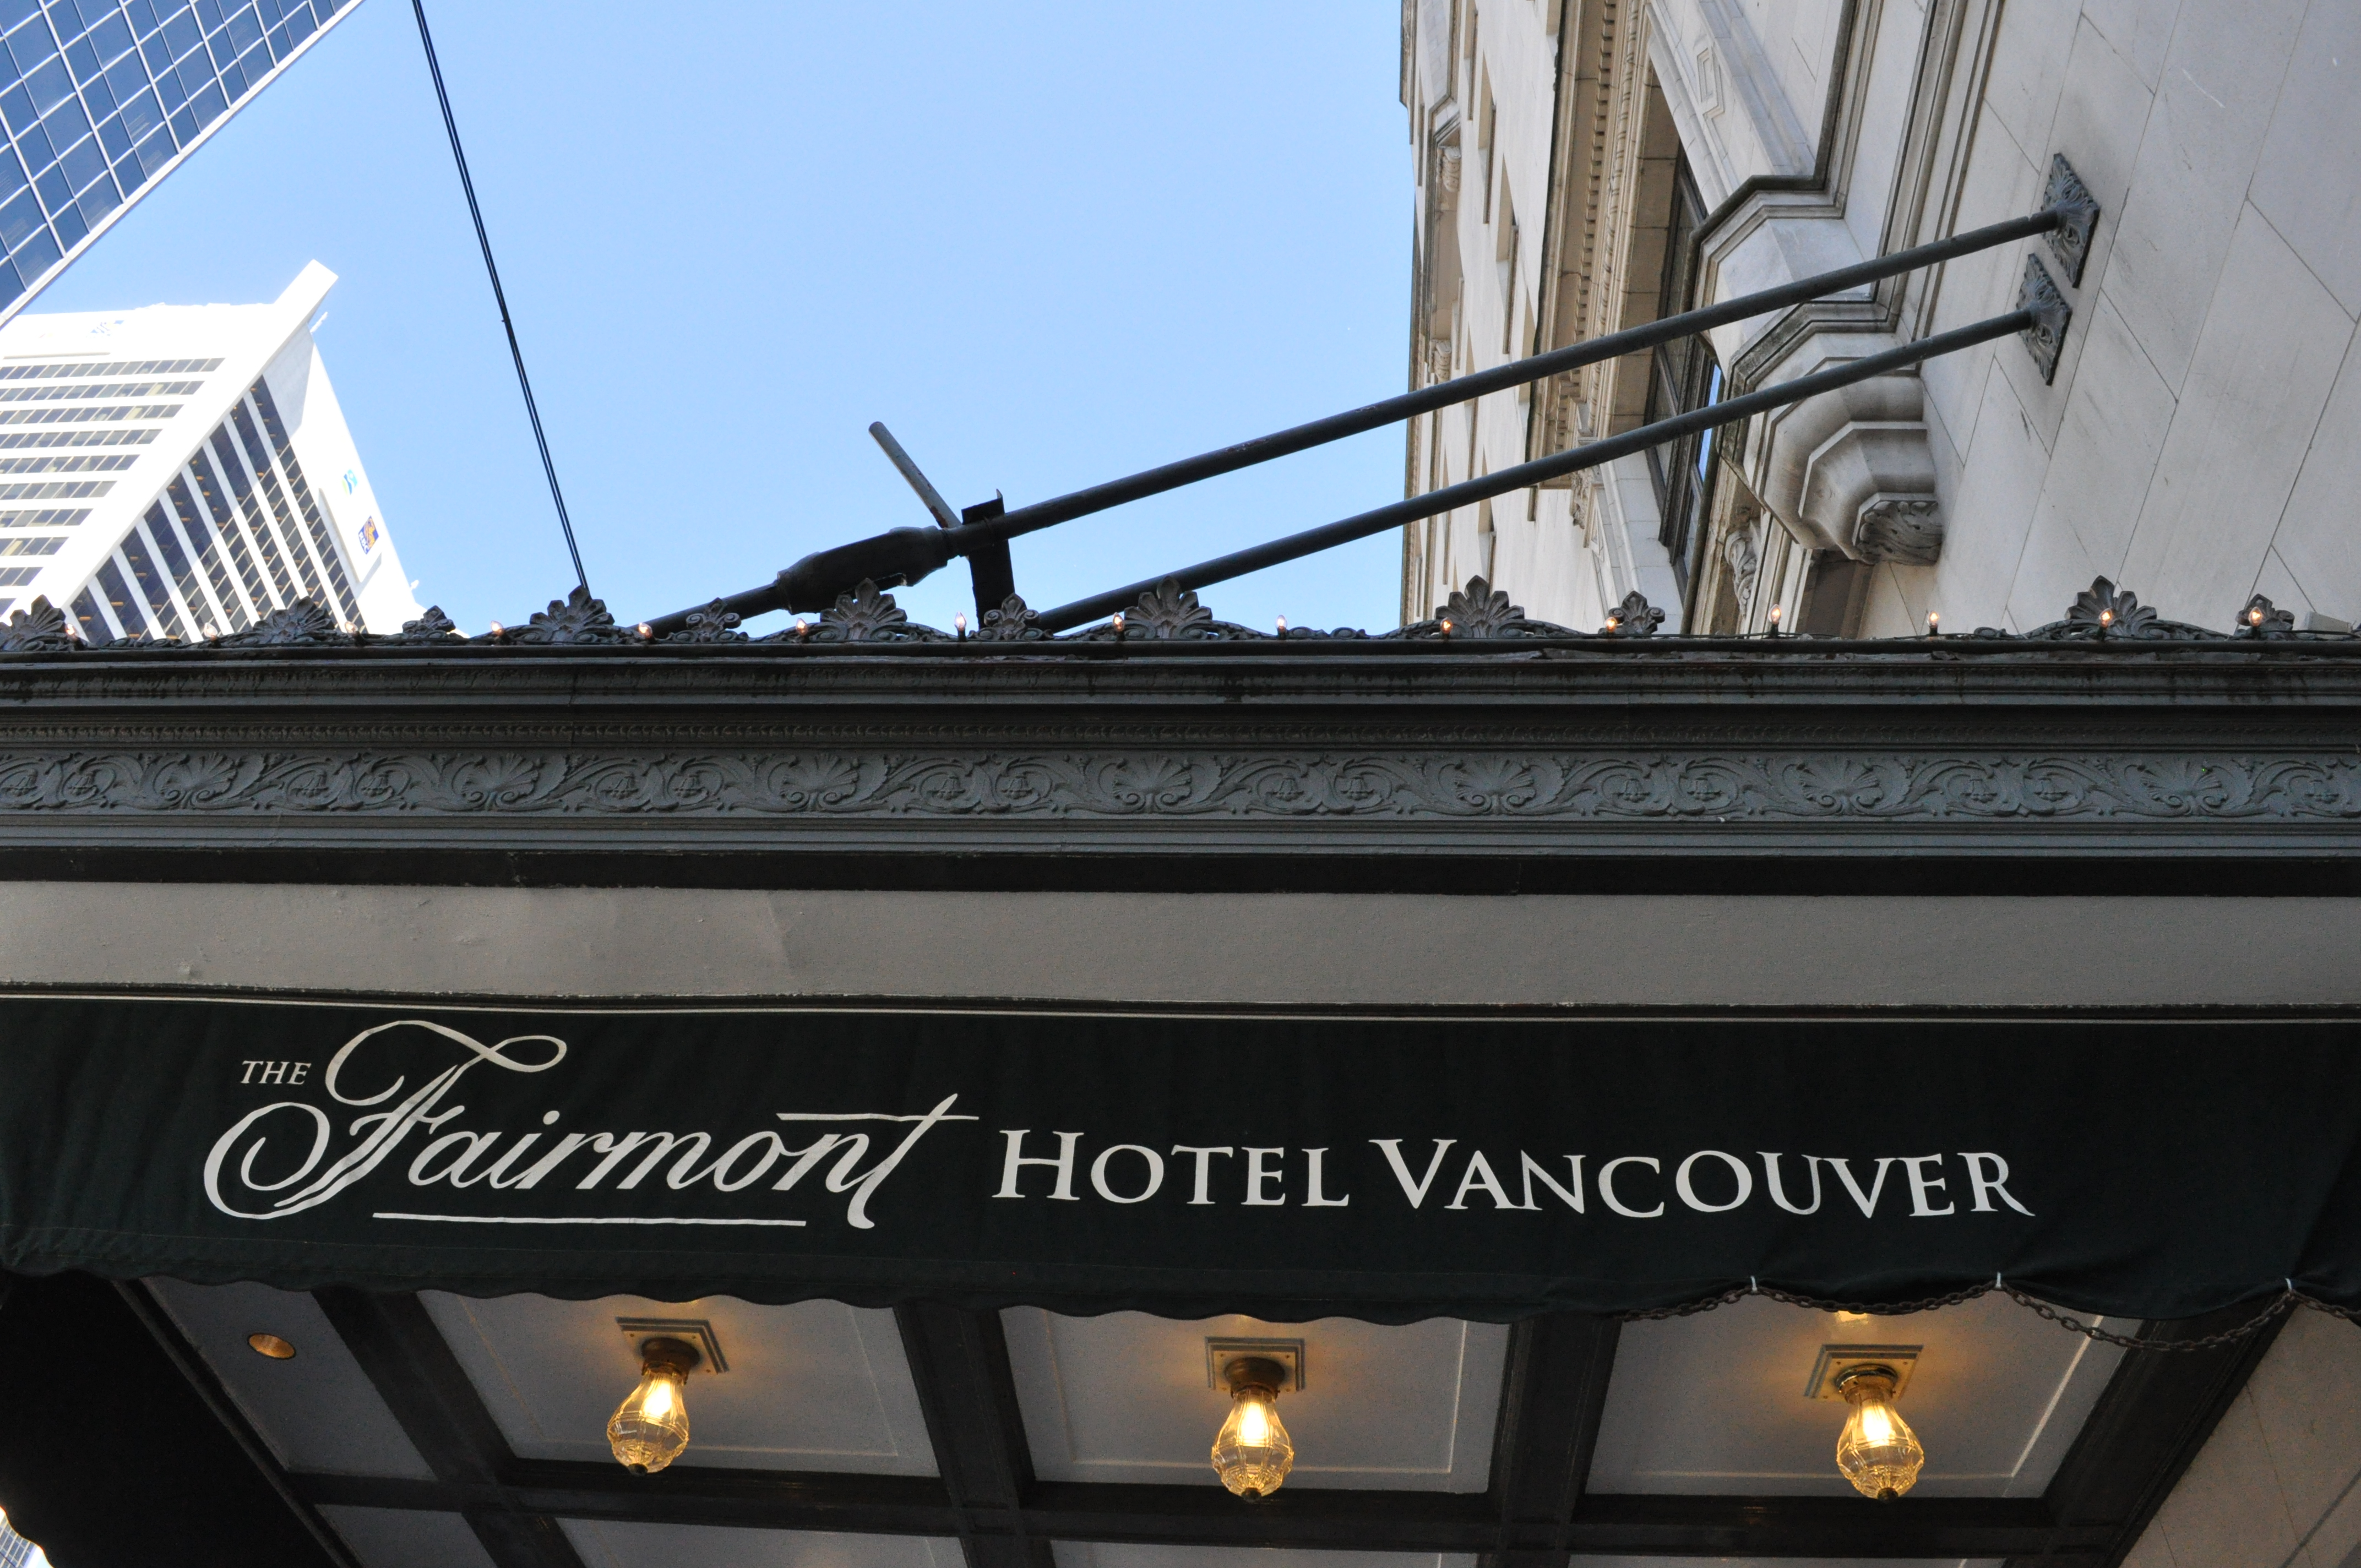 FileHotel Vancouver canopy 01.jpg & File:Hotel Vancouver canopy 01.jpg - Wikimedia Commons